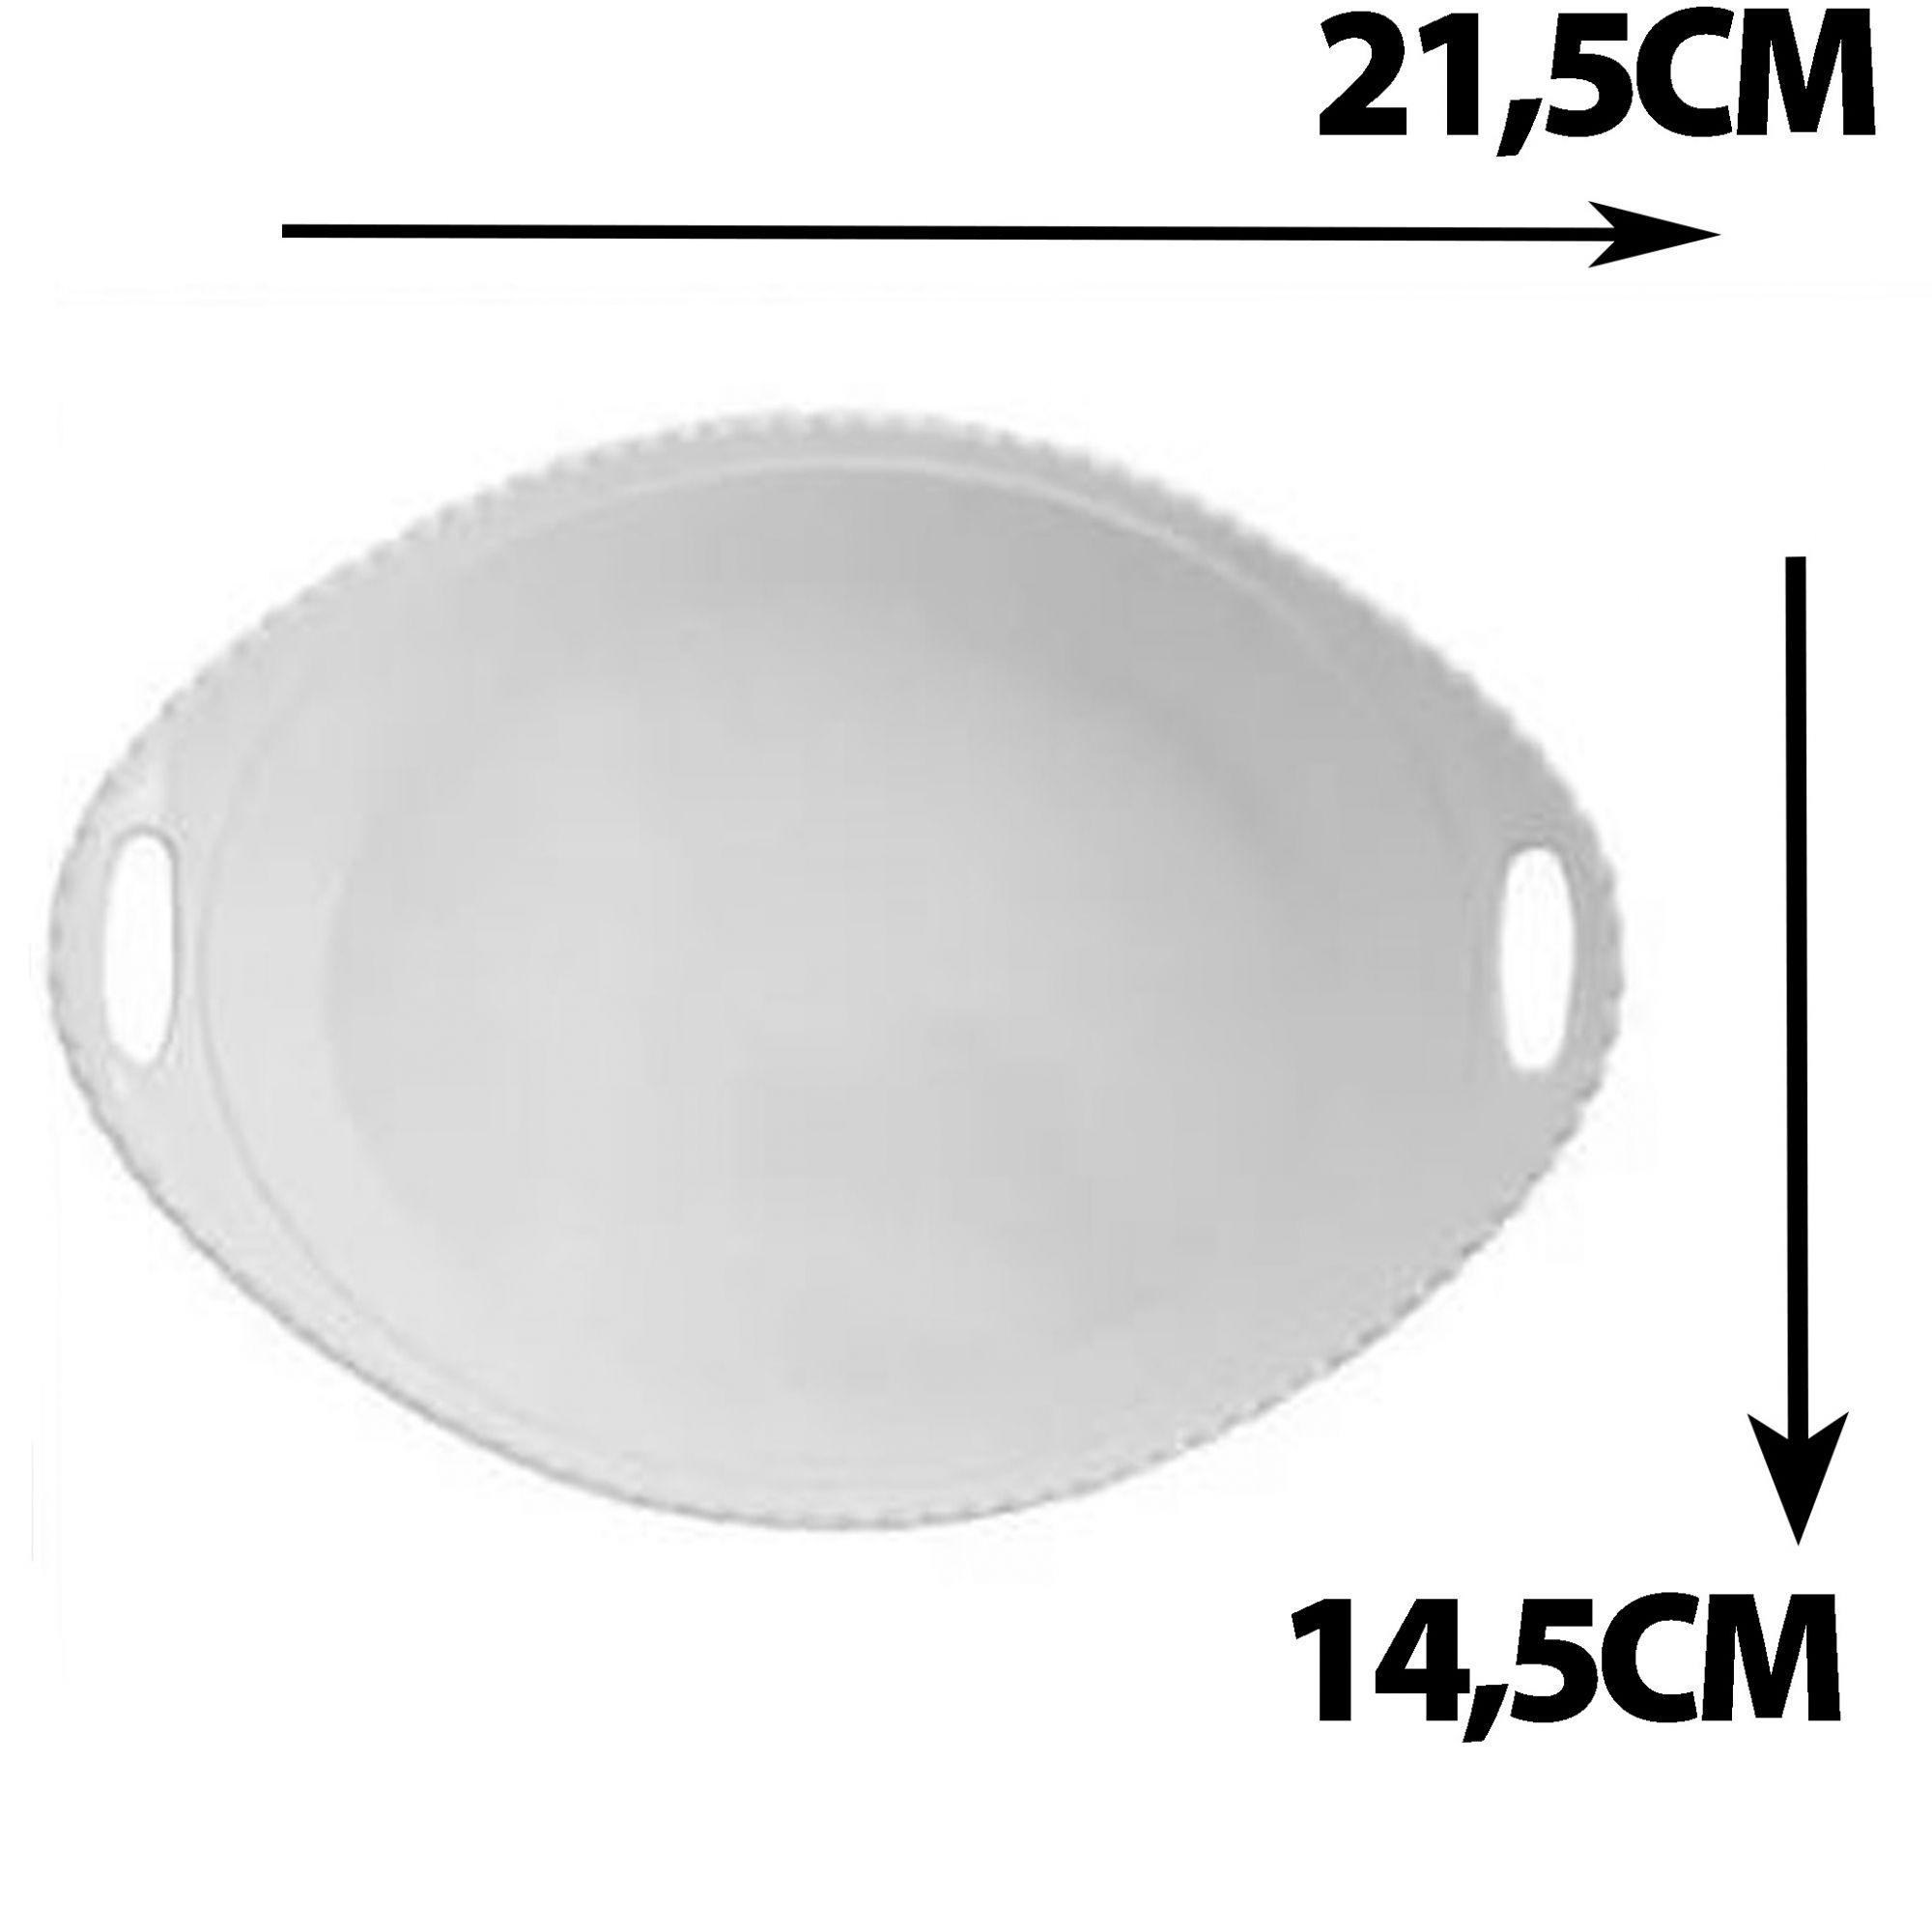 Tigela com Alça 27,7X18,06